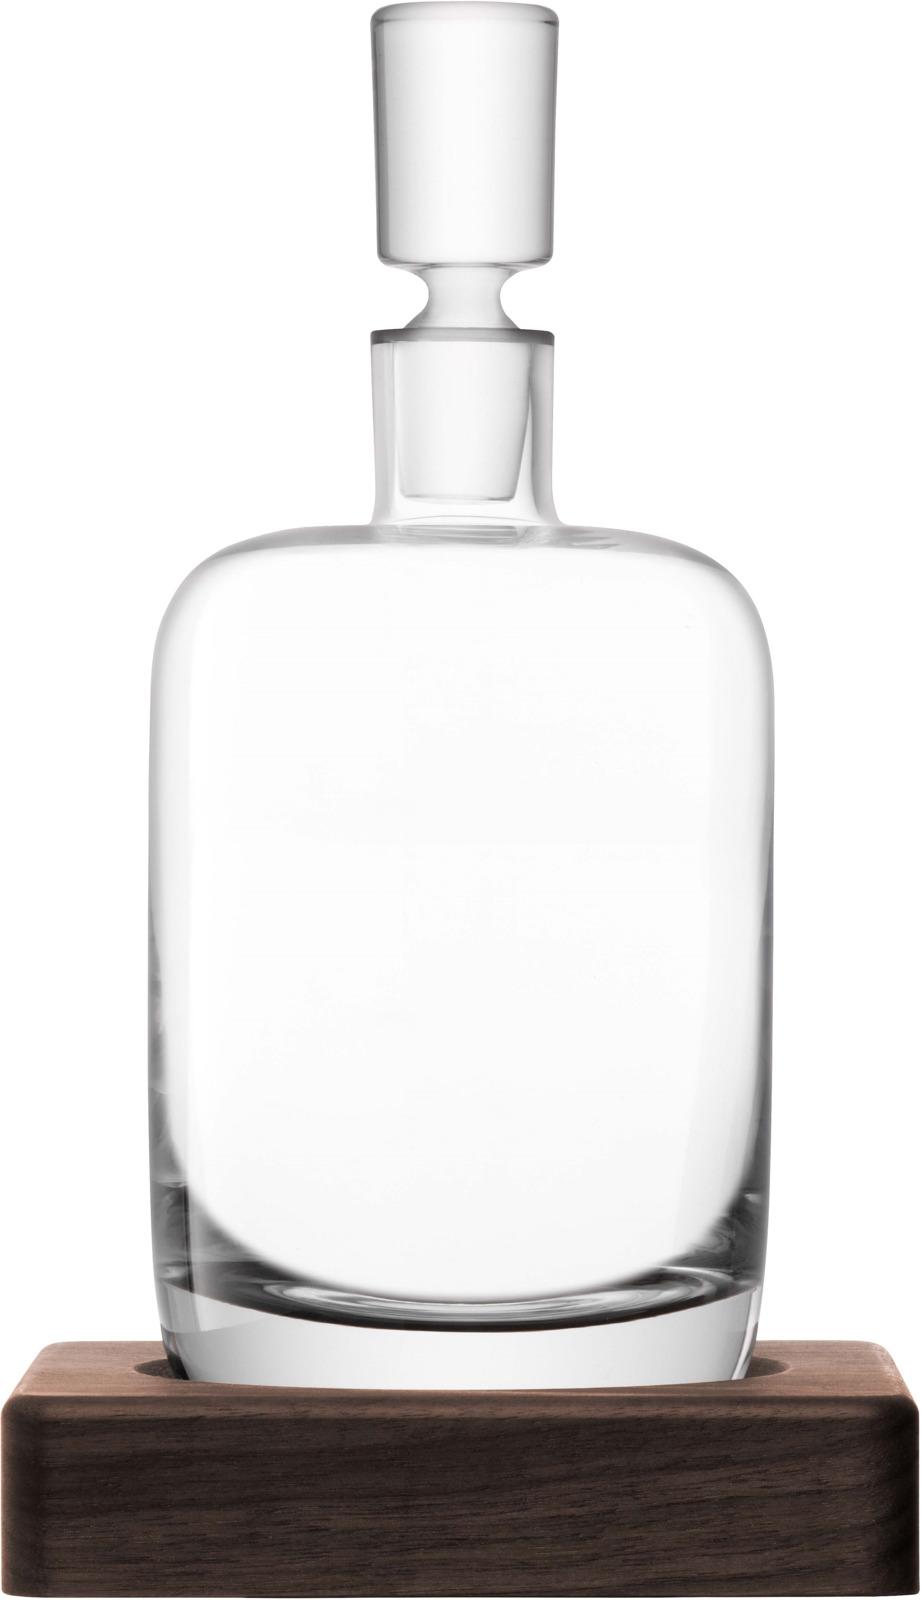 Декантер LSA Renfrew Whisky, с подставкой, 1,1 л декантер lsa international flask 0 8 л